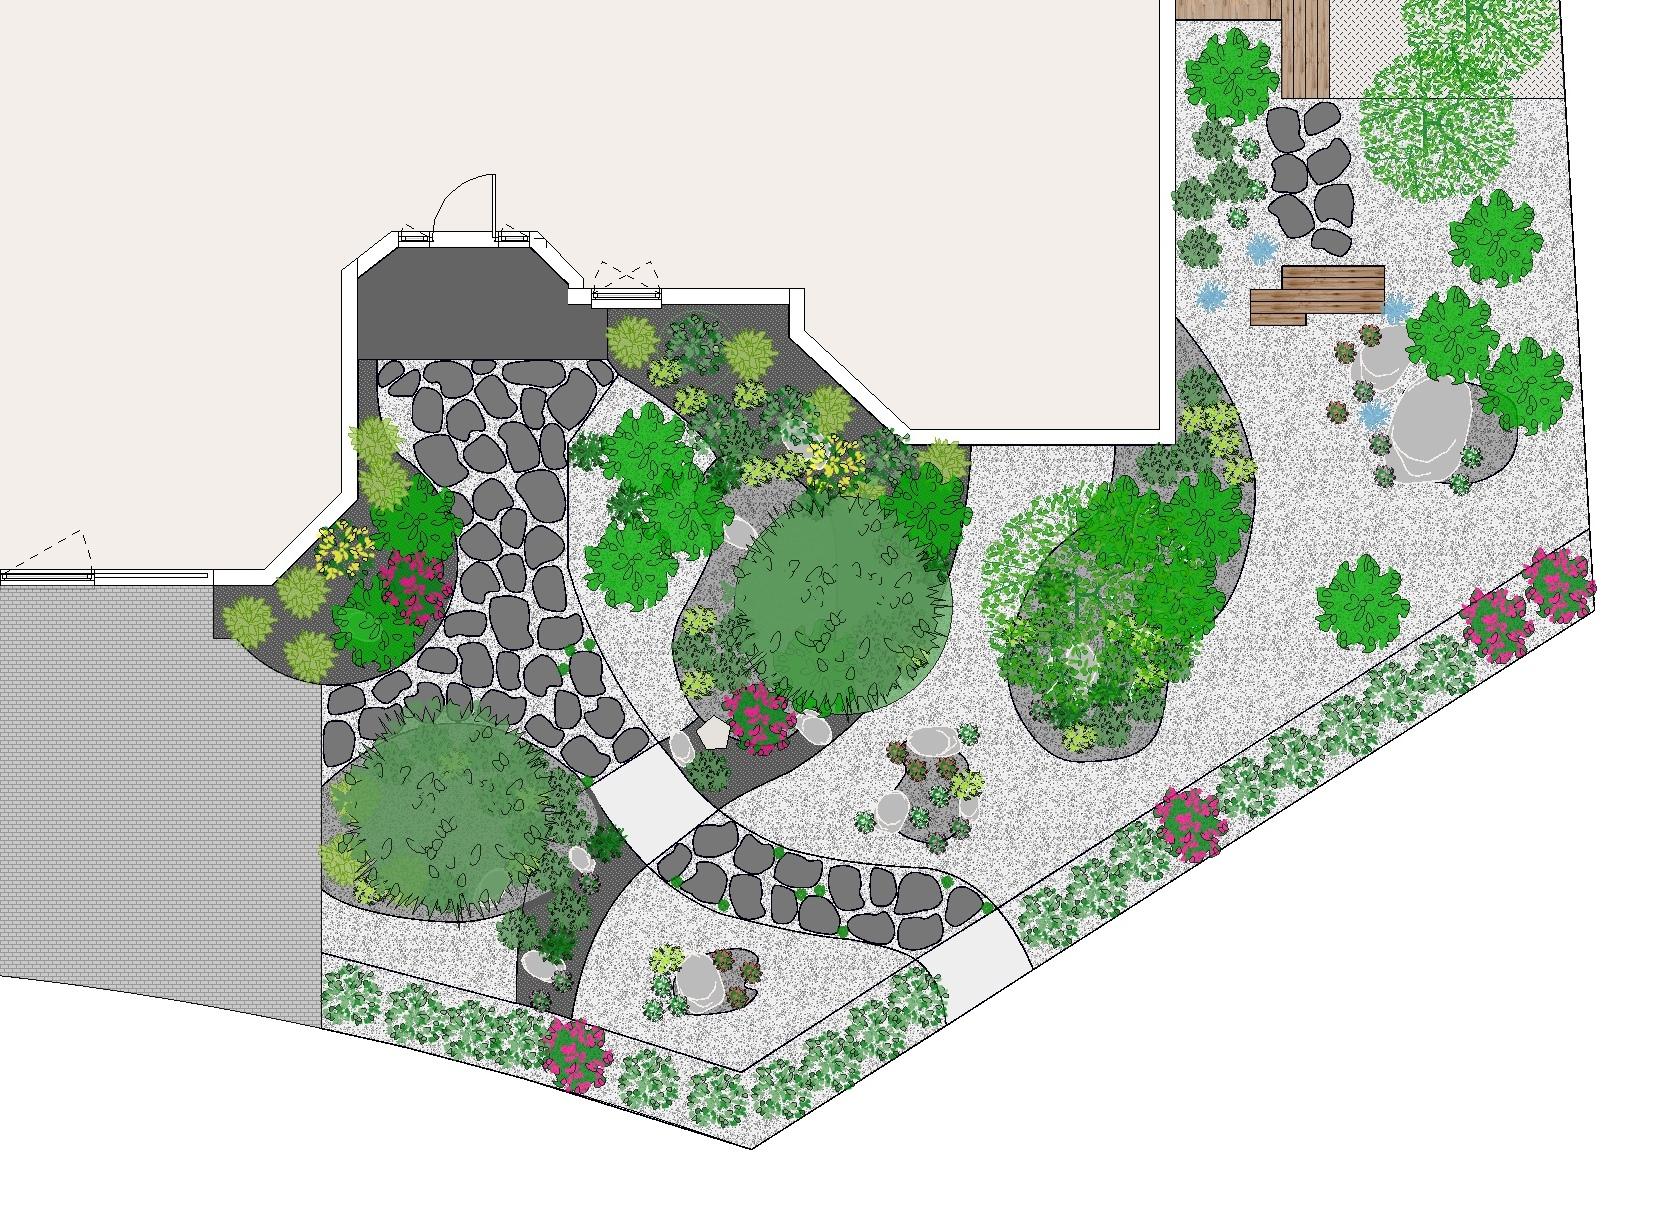 Plan de jardin en vue de dessus